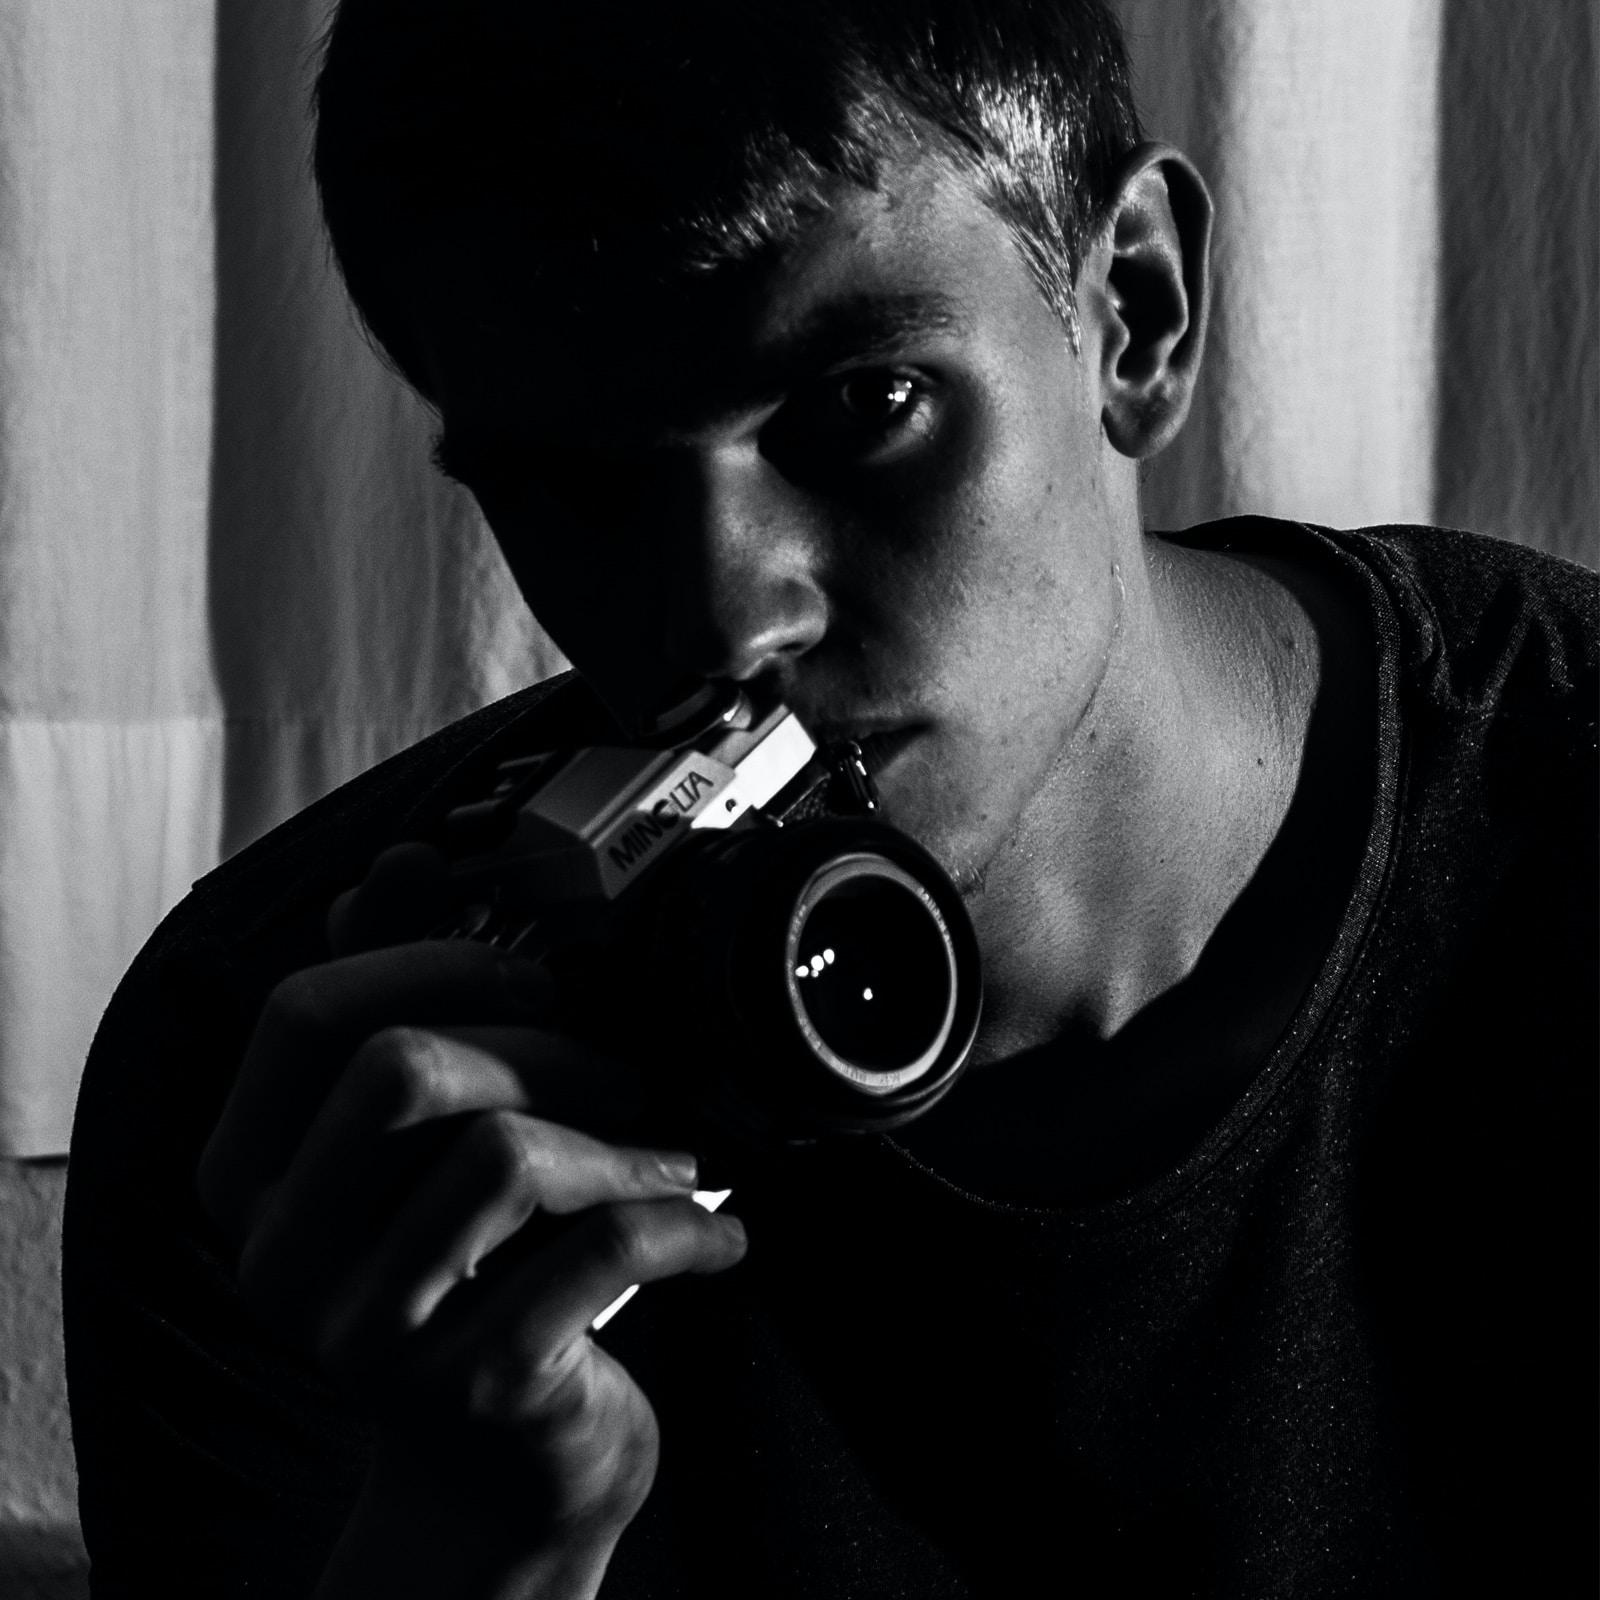 Avatar of user JG Photography